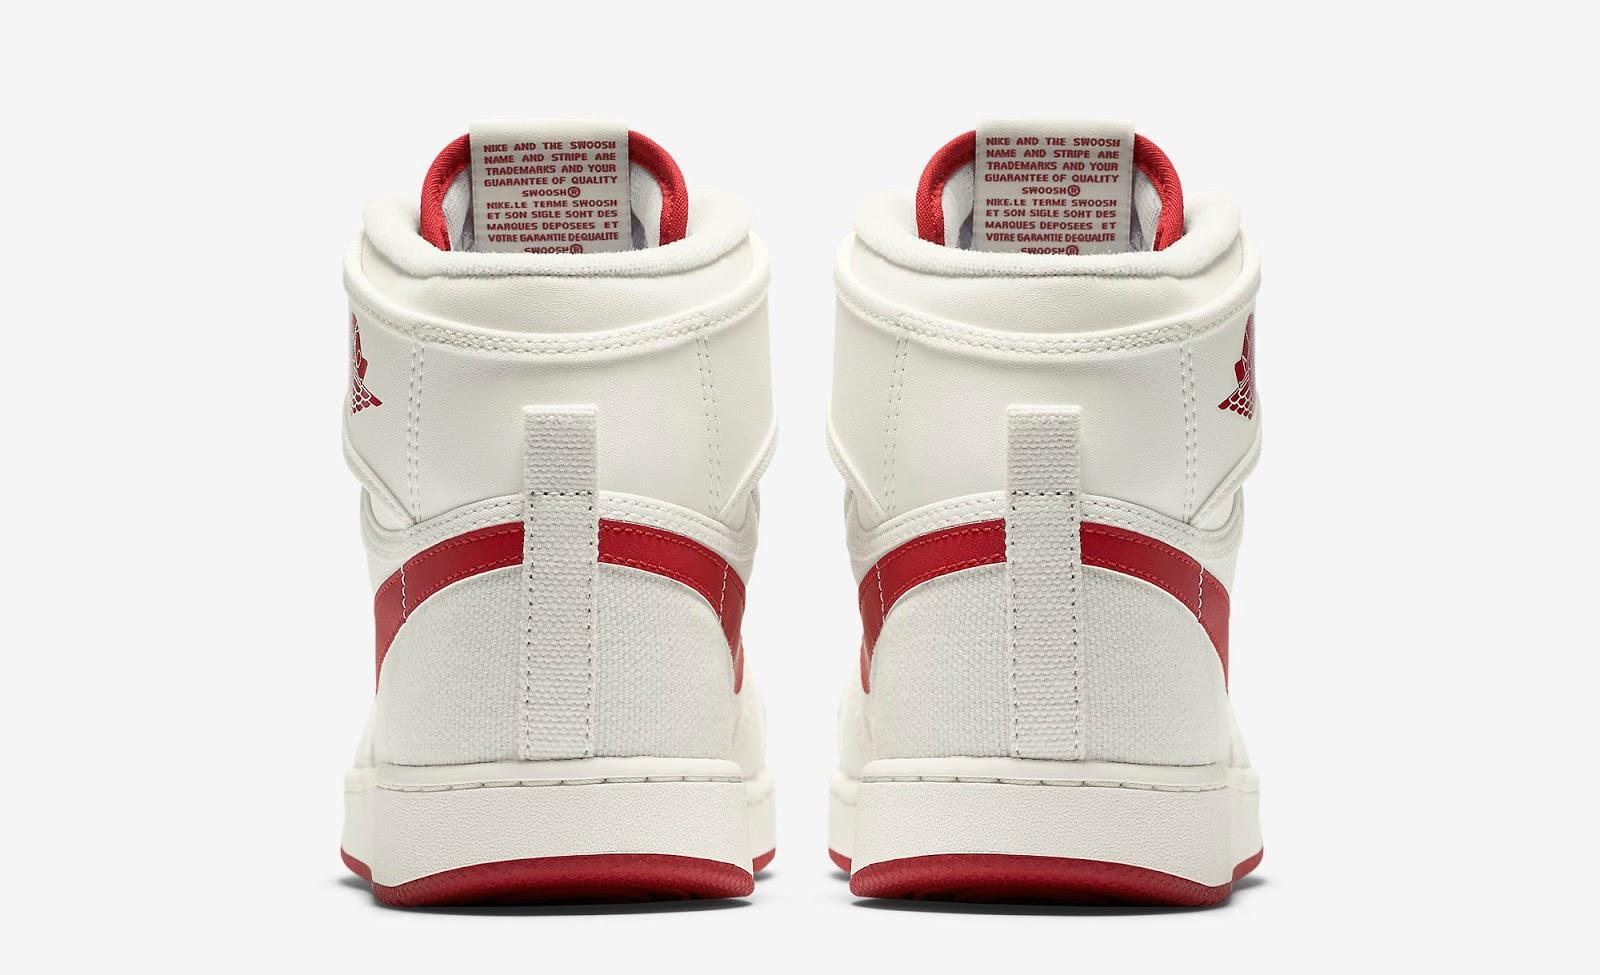 e265872e0544e7 ajordanxi Your  1 Source For Sneaker Release Dates  Air Jordan 1 Retro KO  High OG Sail Varsity Red Release Reminder